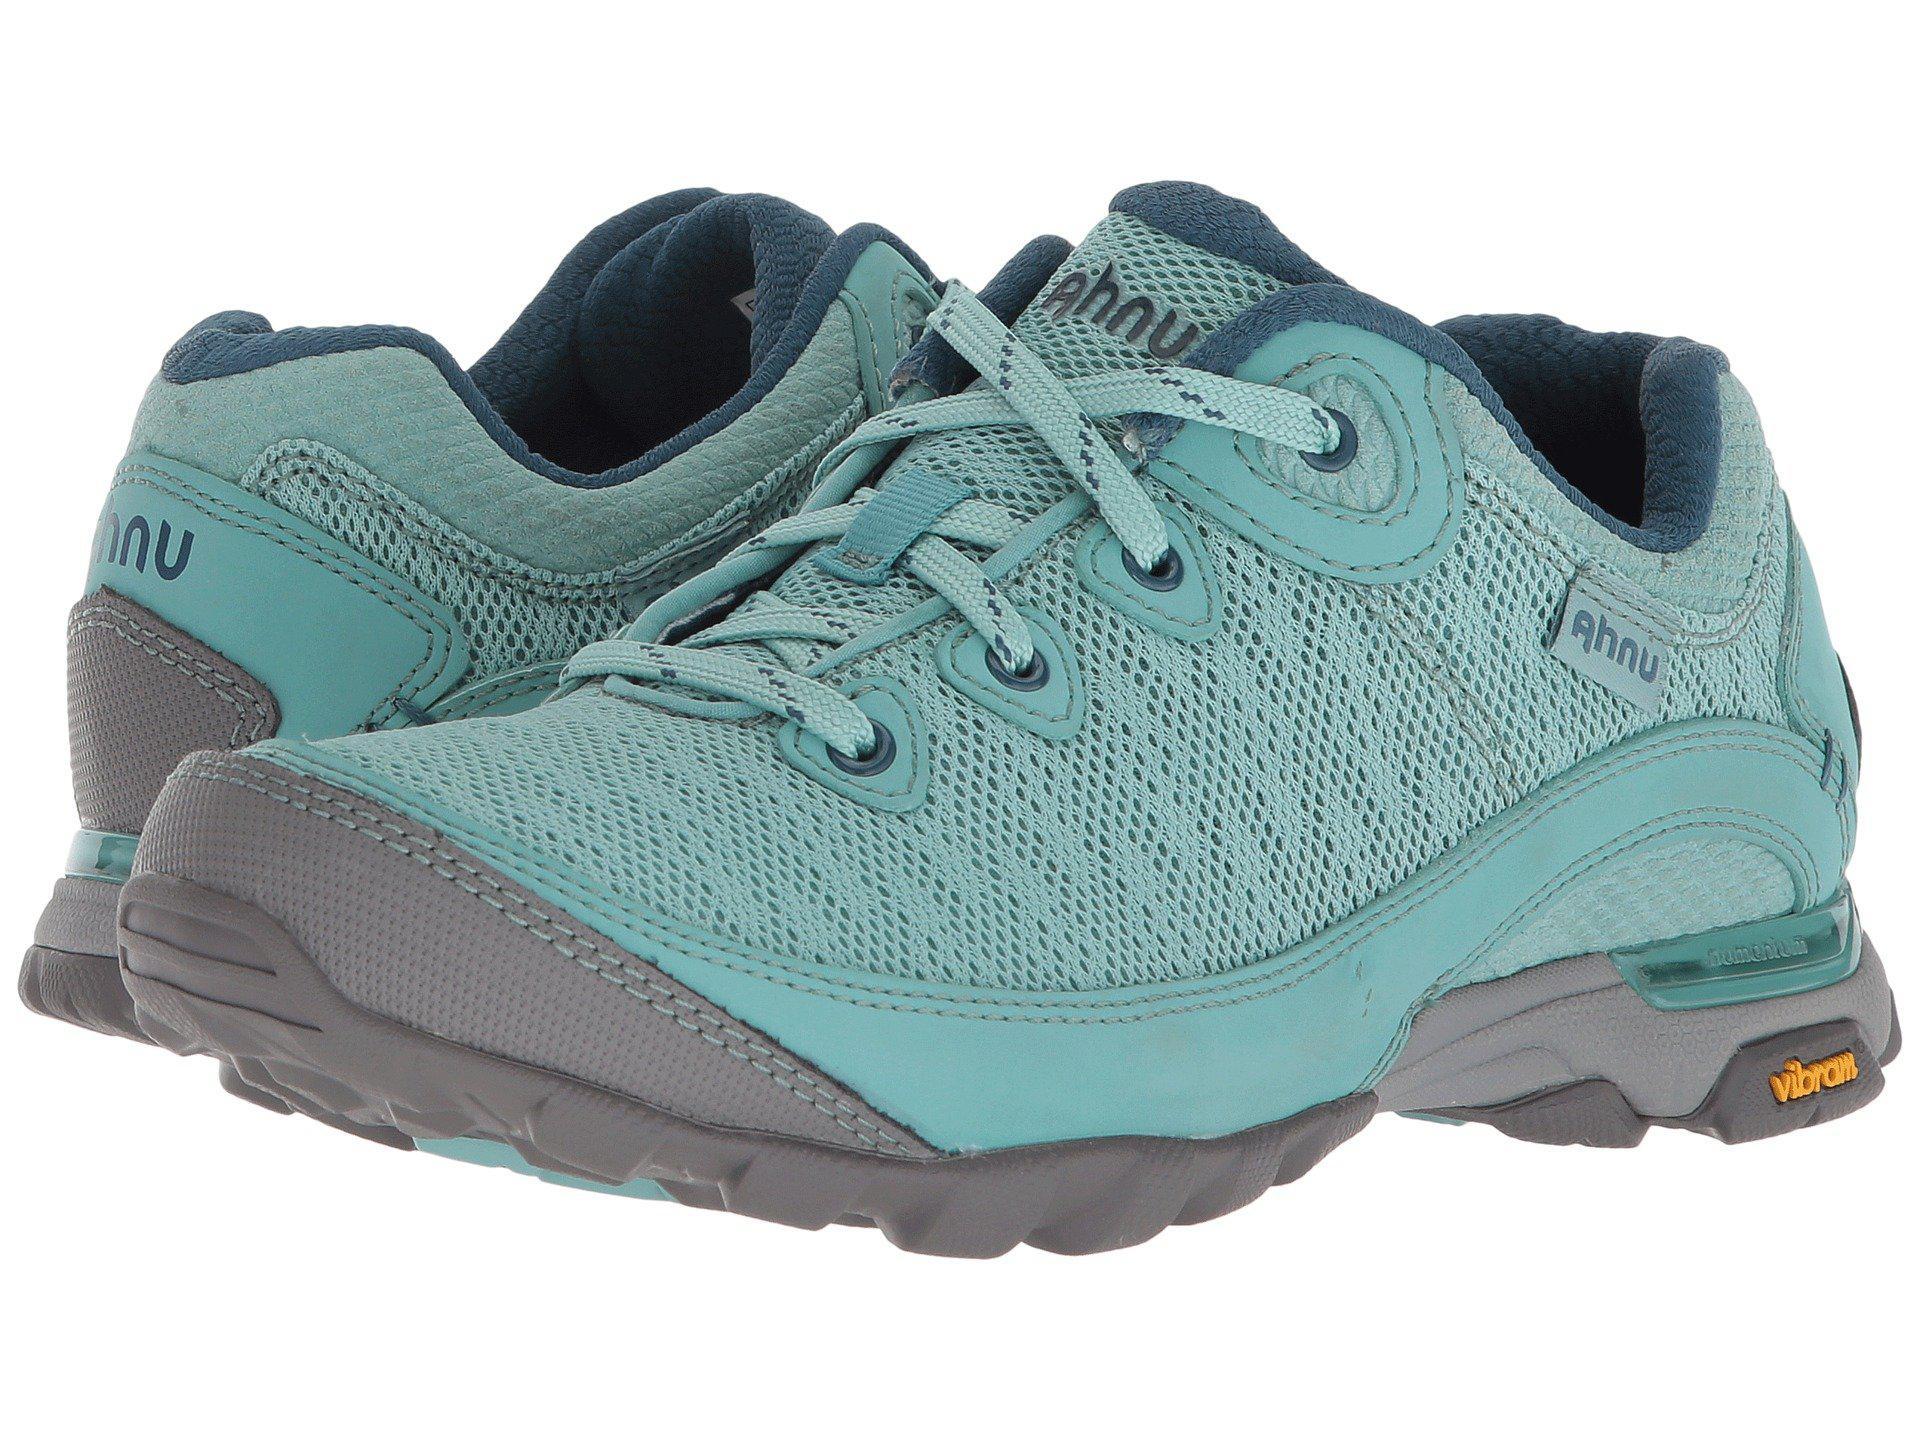 7bdd0090aad Lyst - Teva Sugarpine Ii Air Mesh (wild Dove) Women's Shoes in Blue